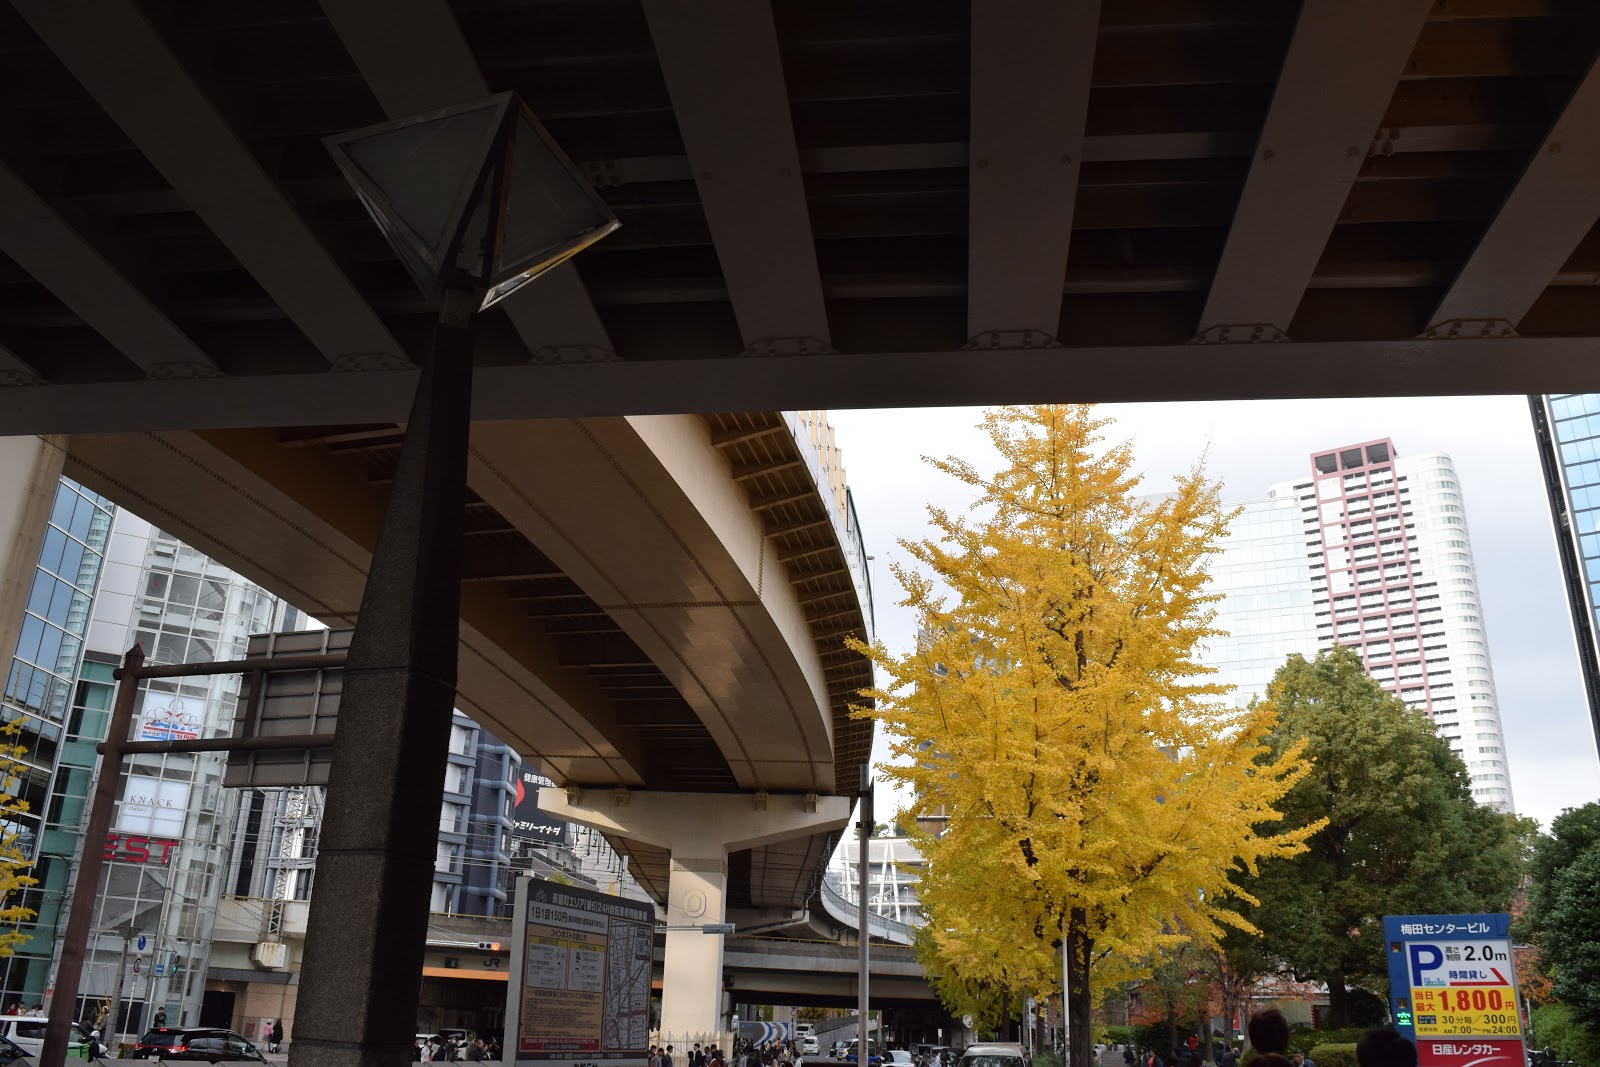 Elevated highway and gingko tree in Osaka, Japan